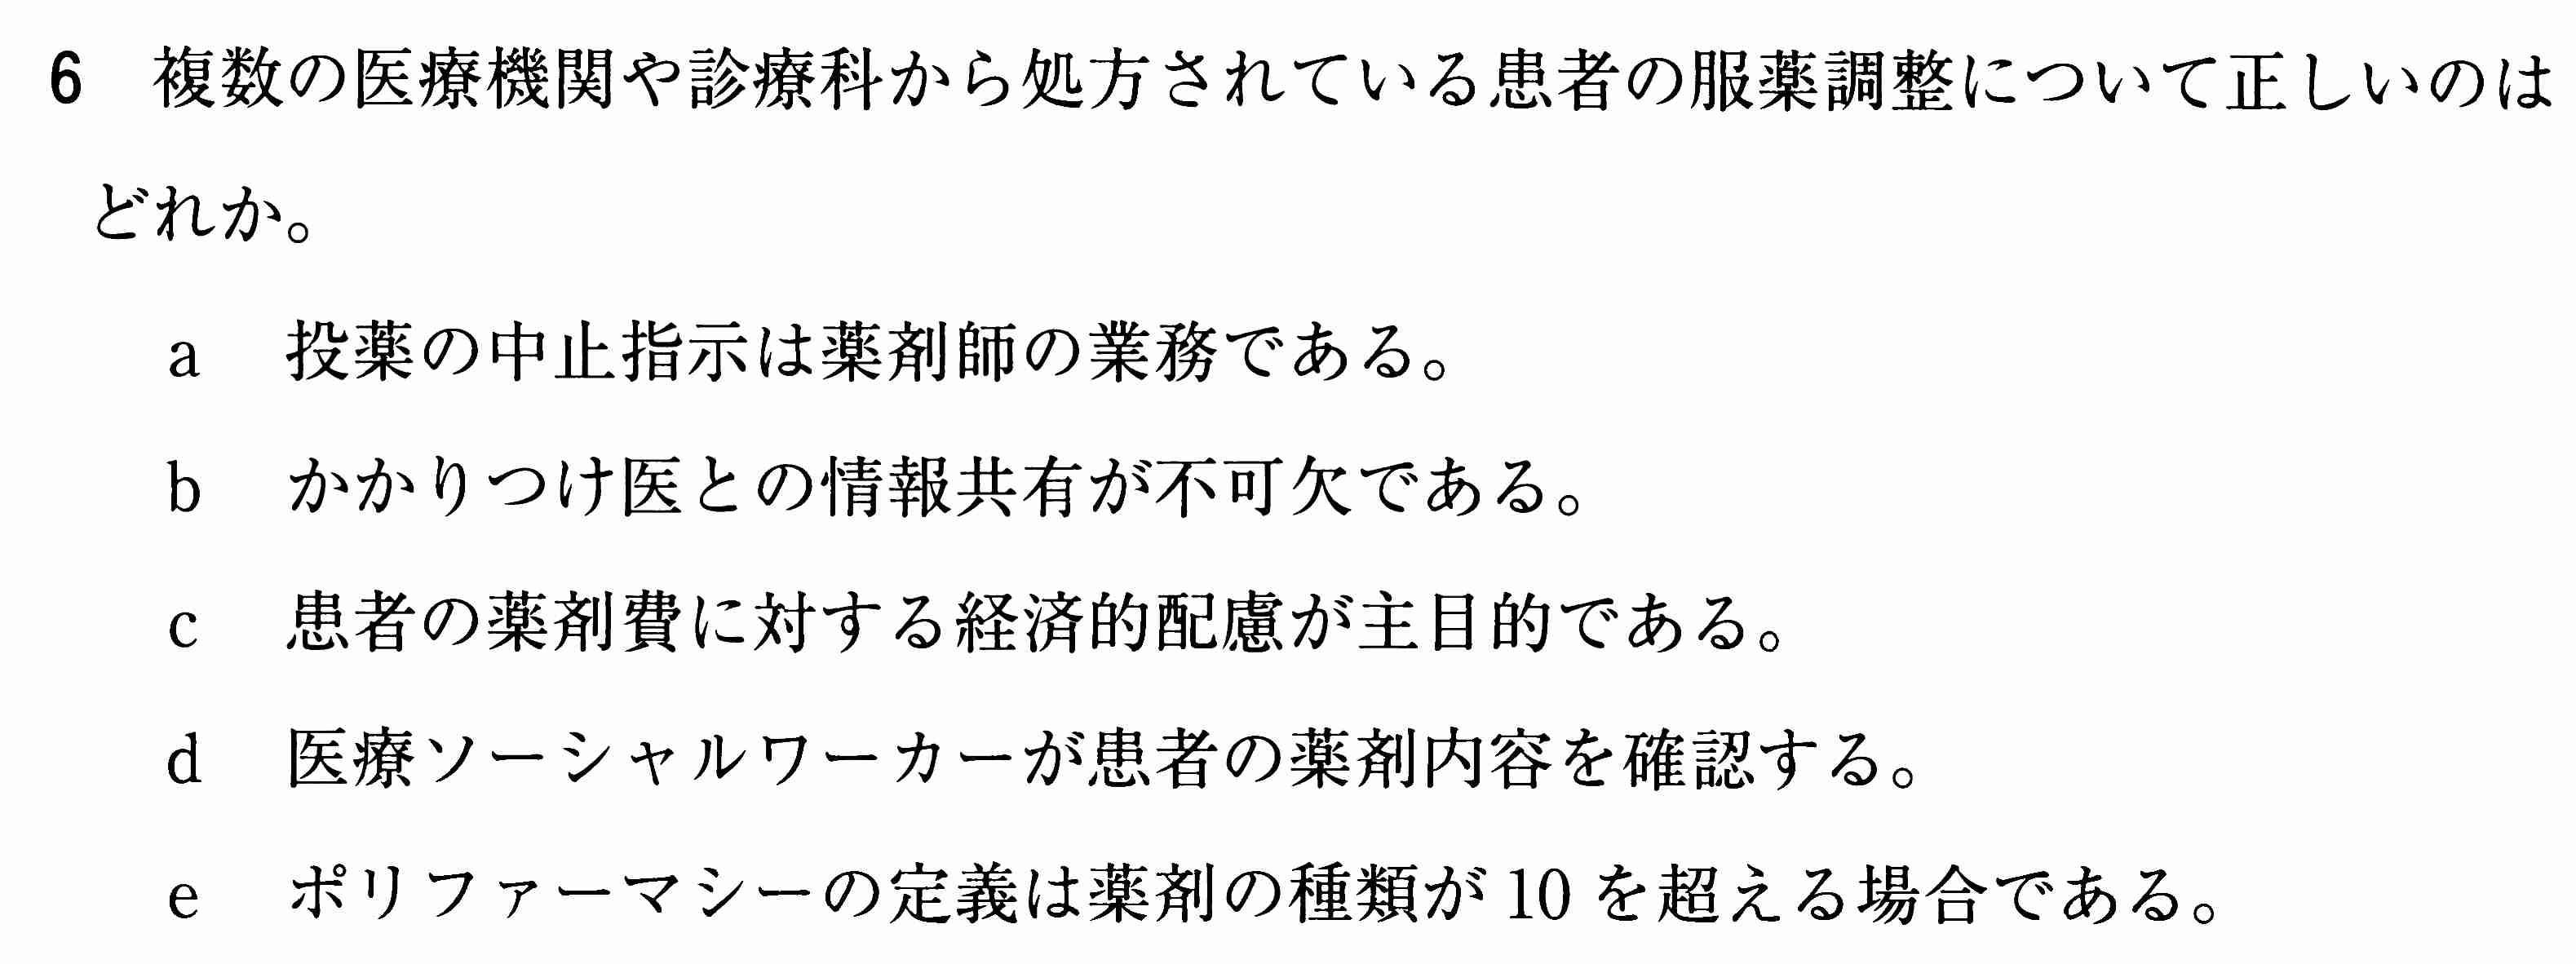 111C6.jpg